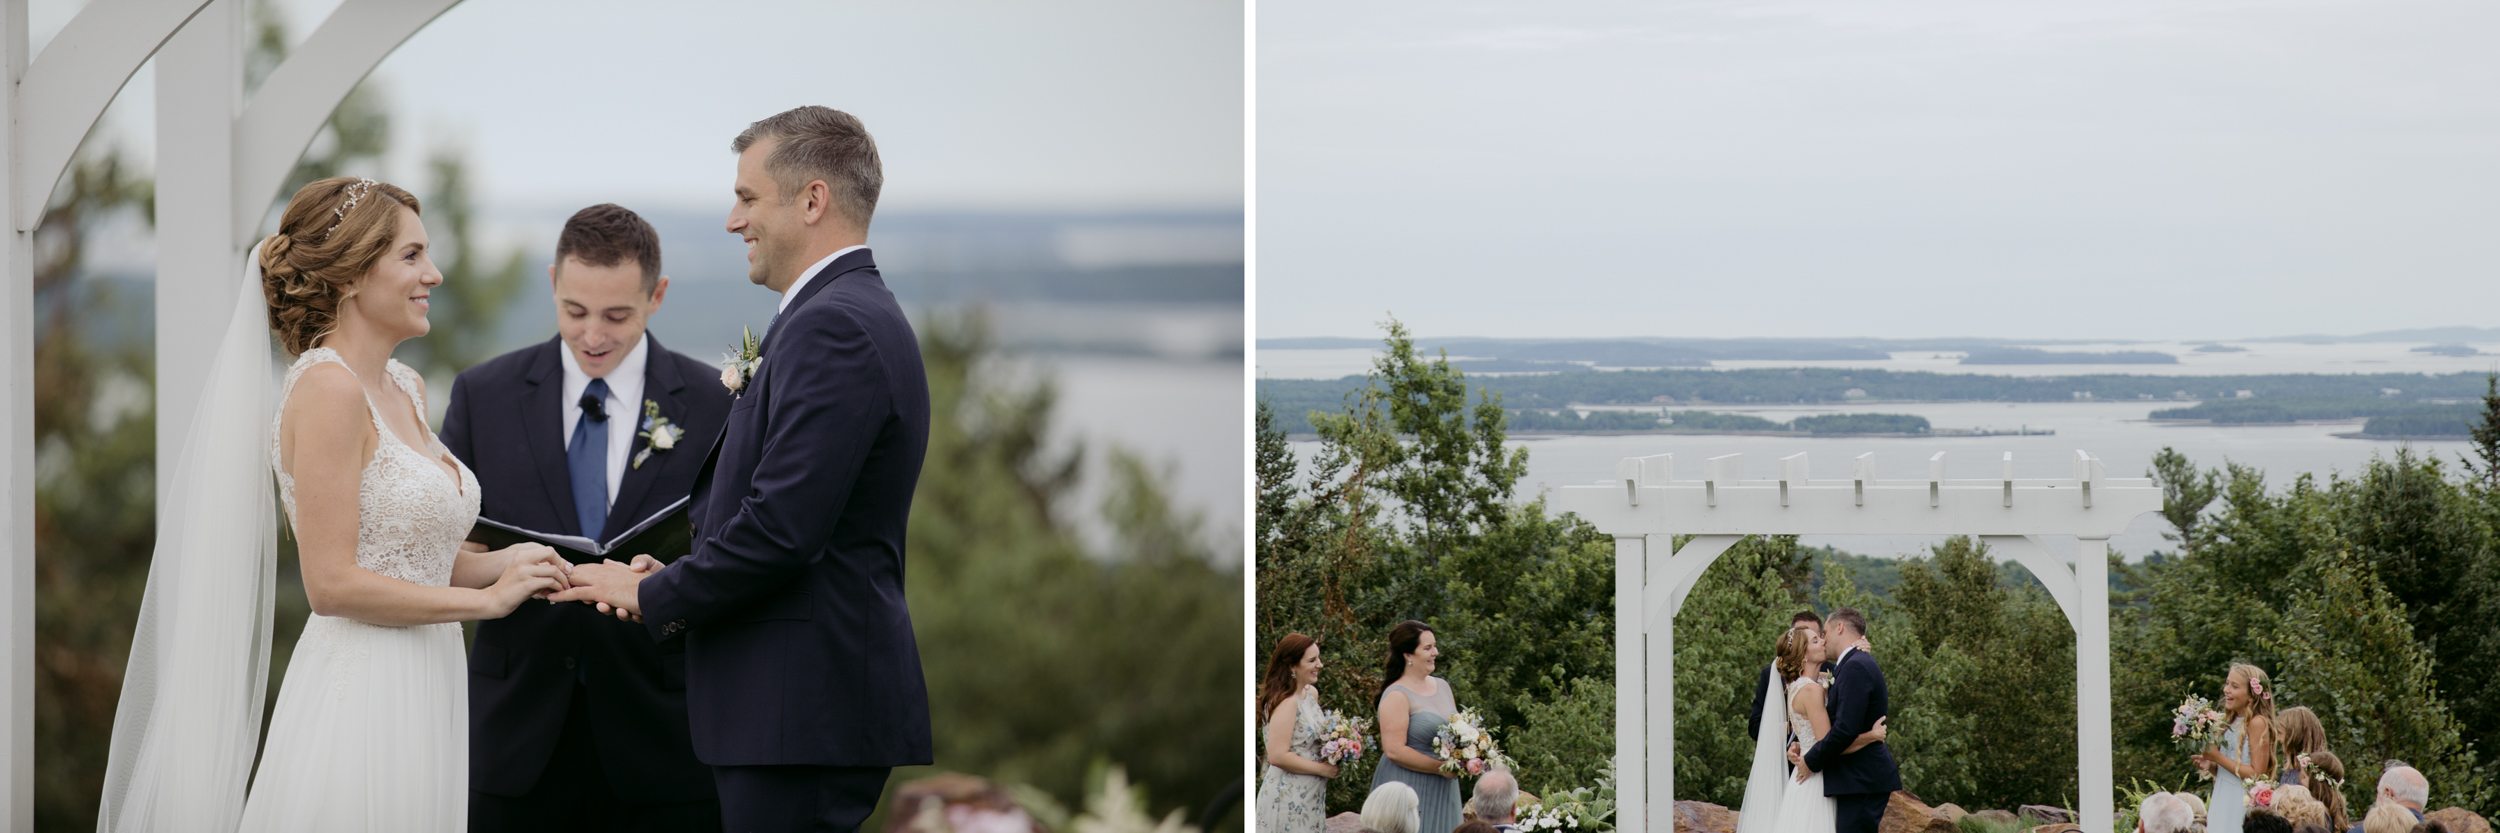 point_lookout_northport_Maine_Midcoast_wedding_leslie_justin-16.jpg